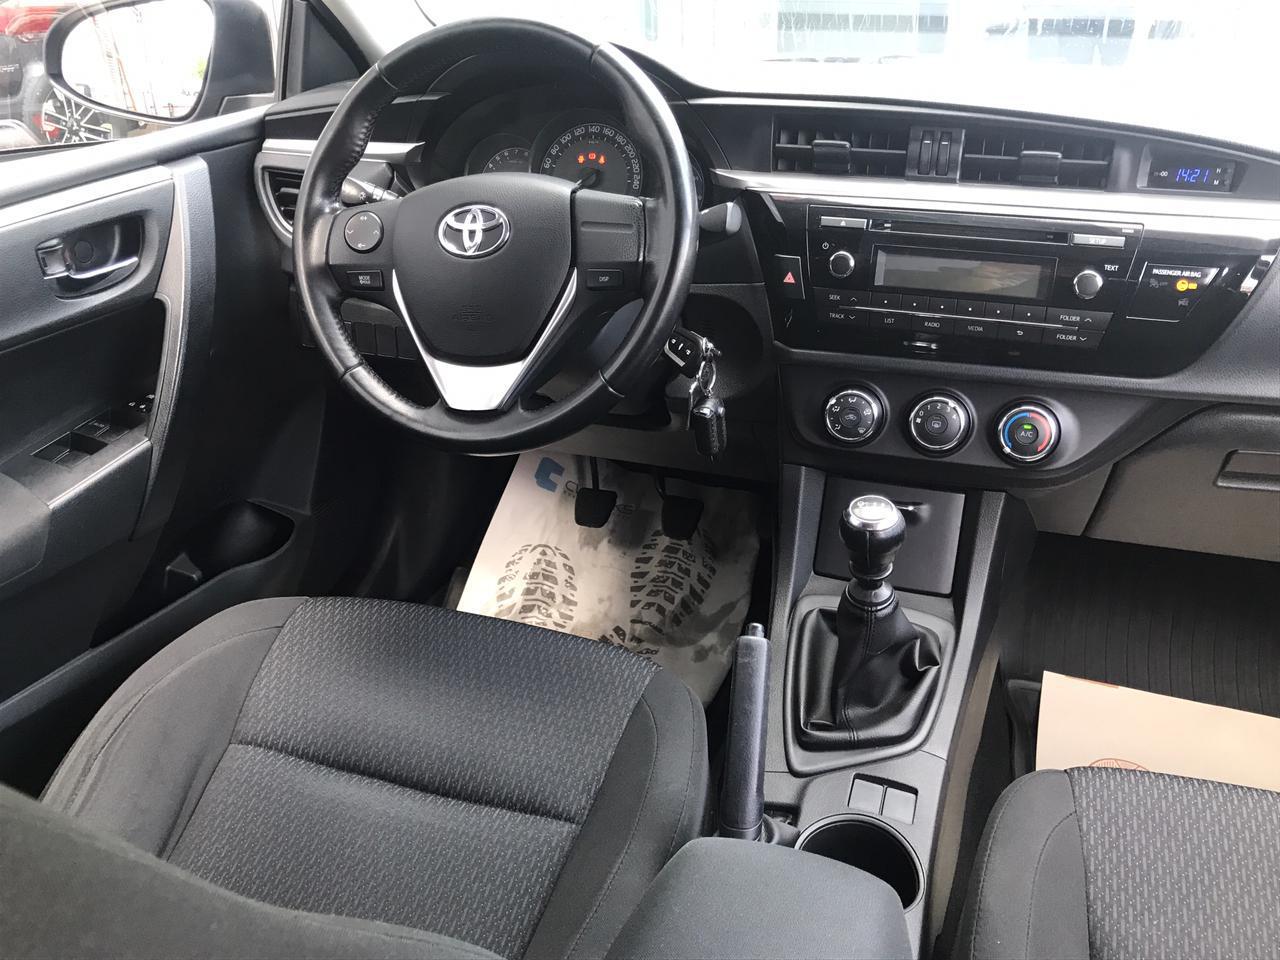 Toyota | Corolla, XI (E160, E170)